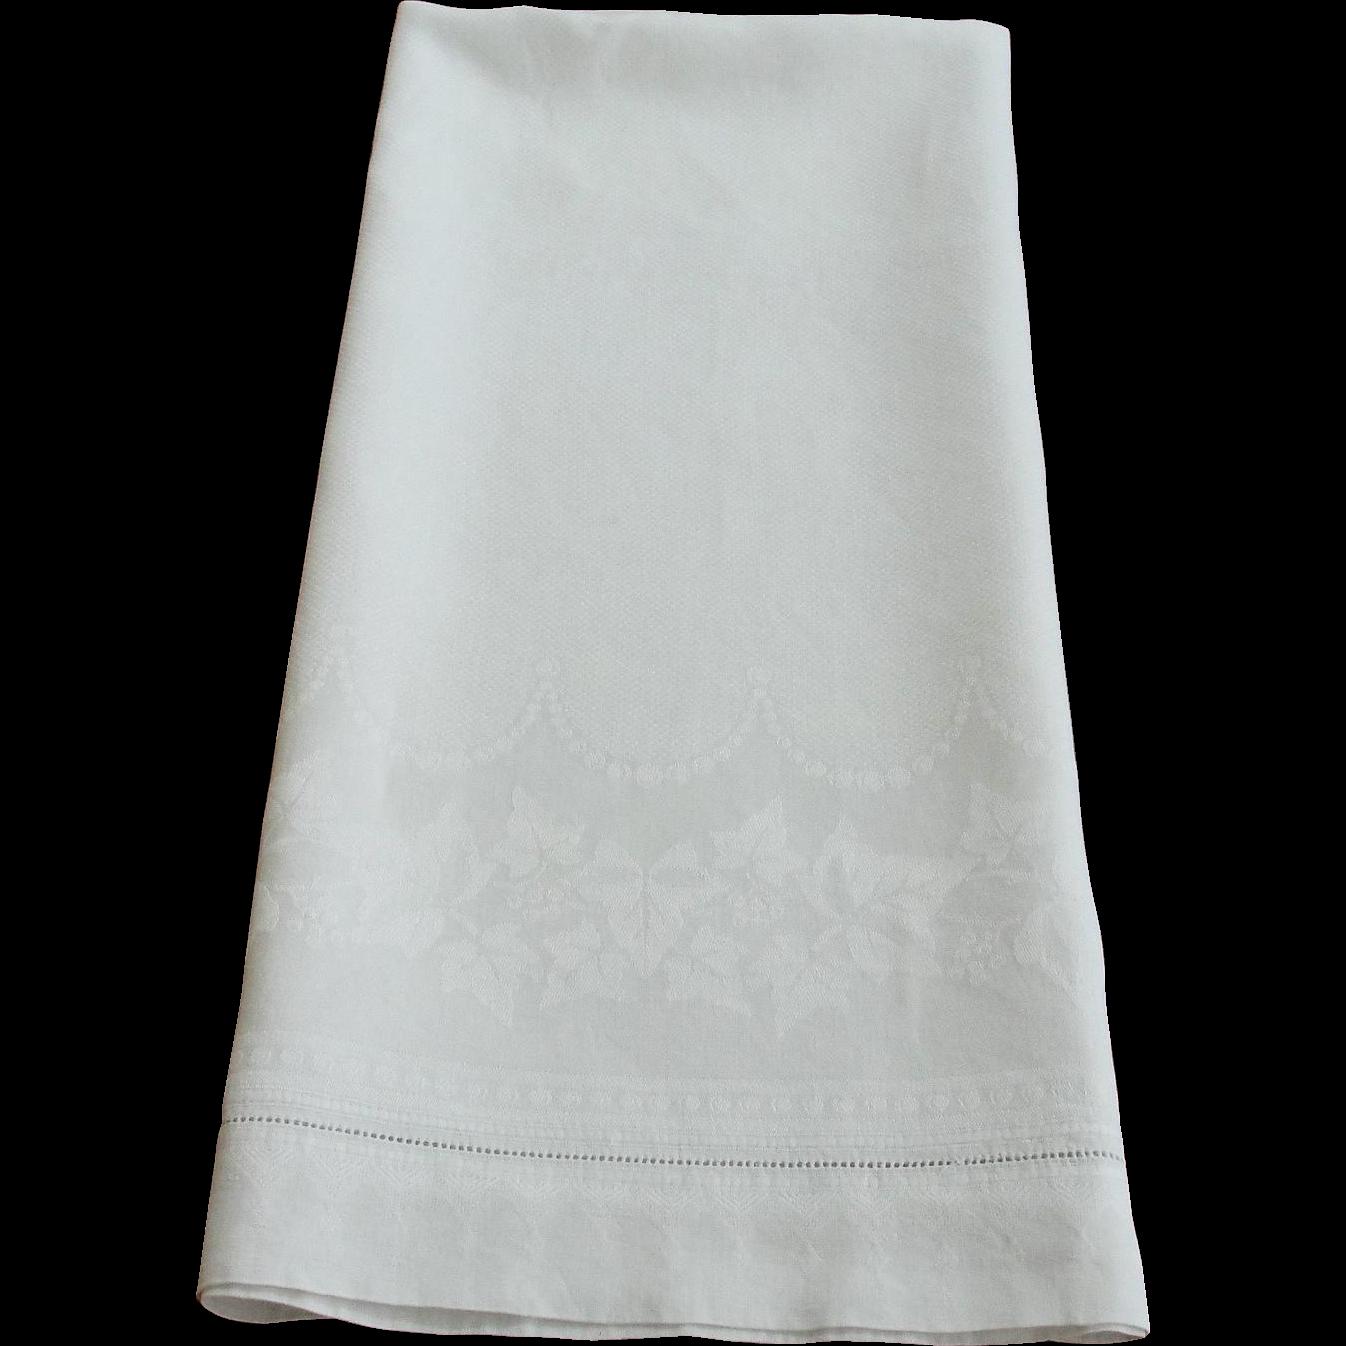 Large Antique White Linen Damask Towel